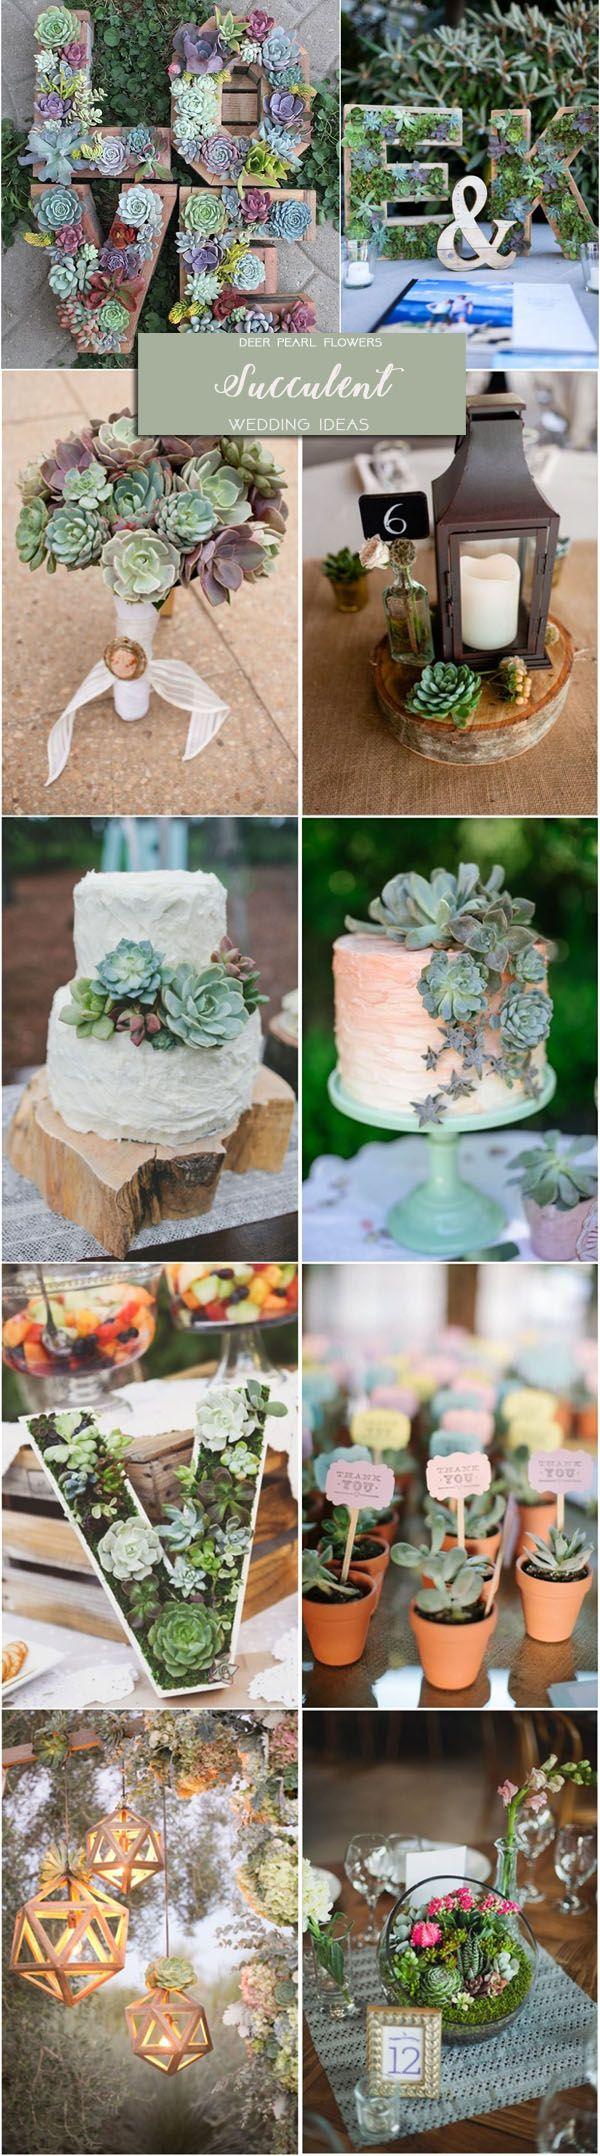 Top rustic wedding themes u ideas for part ii green